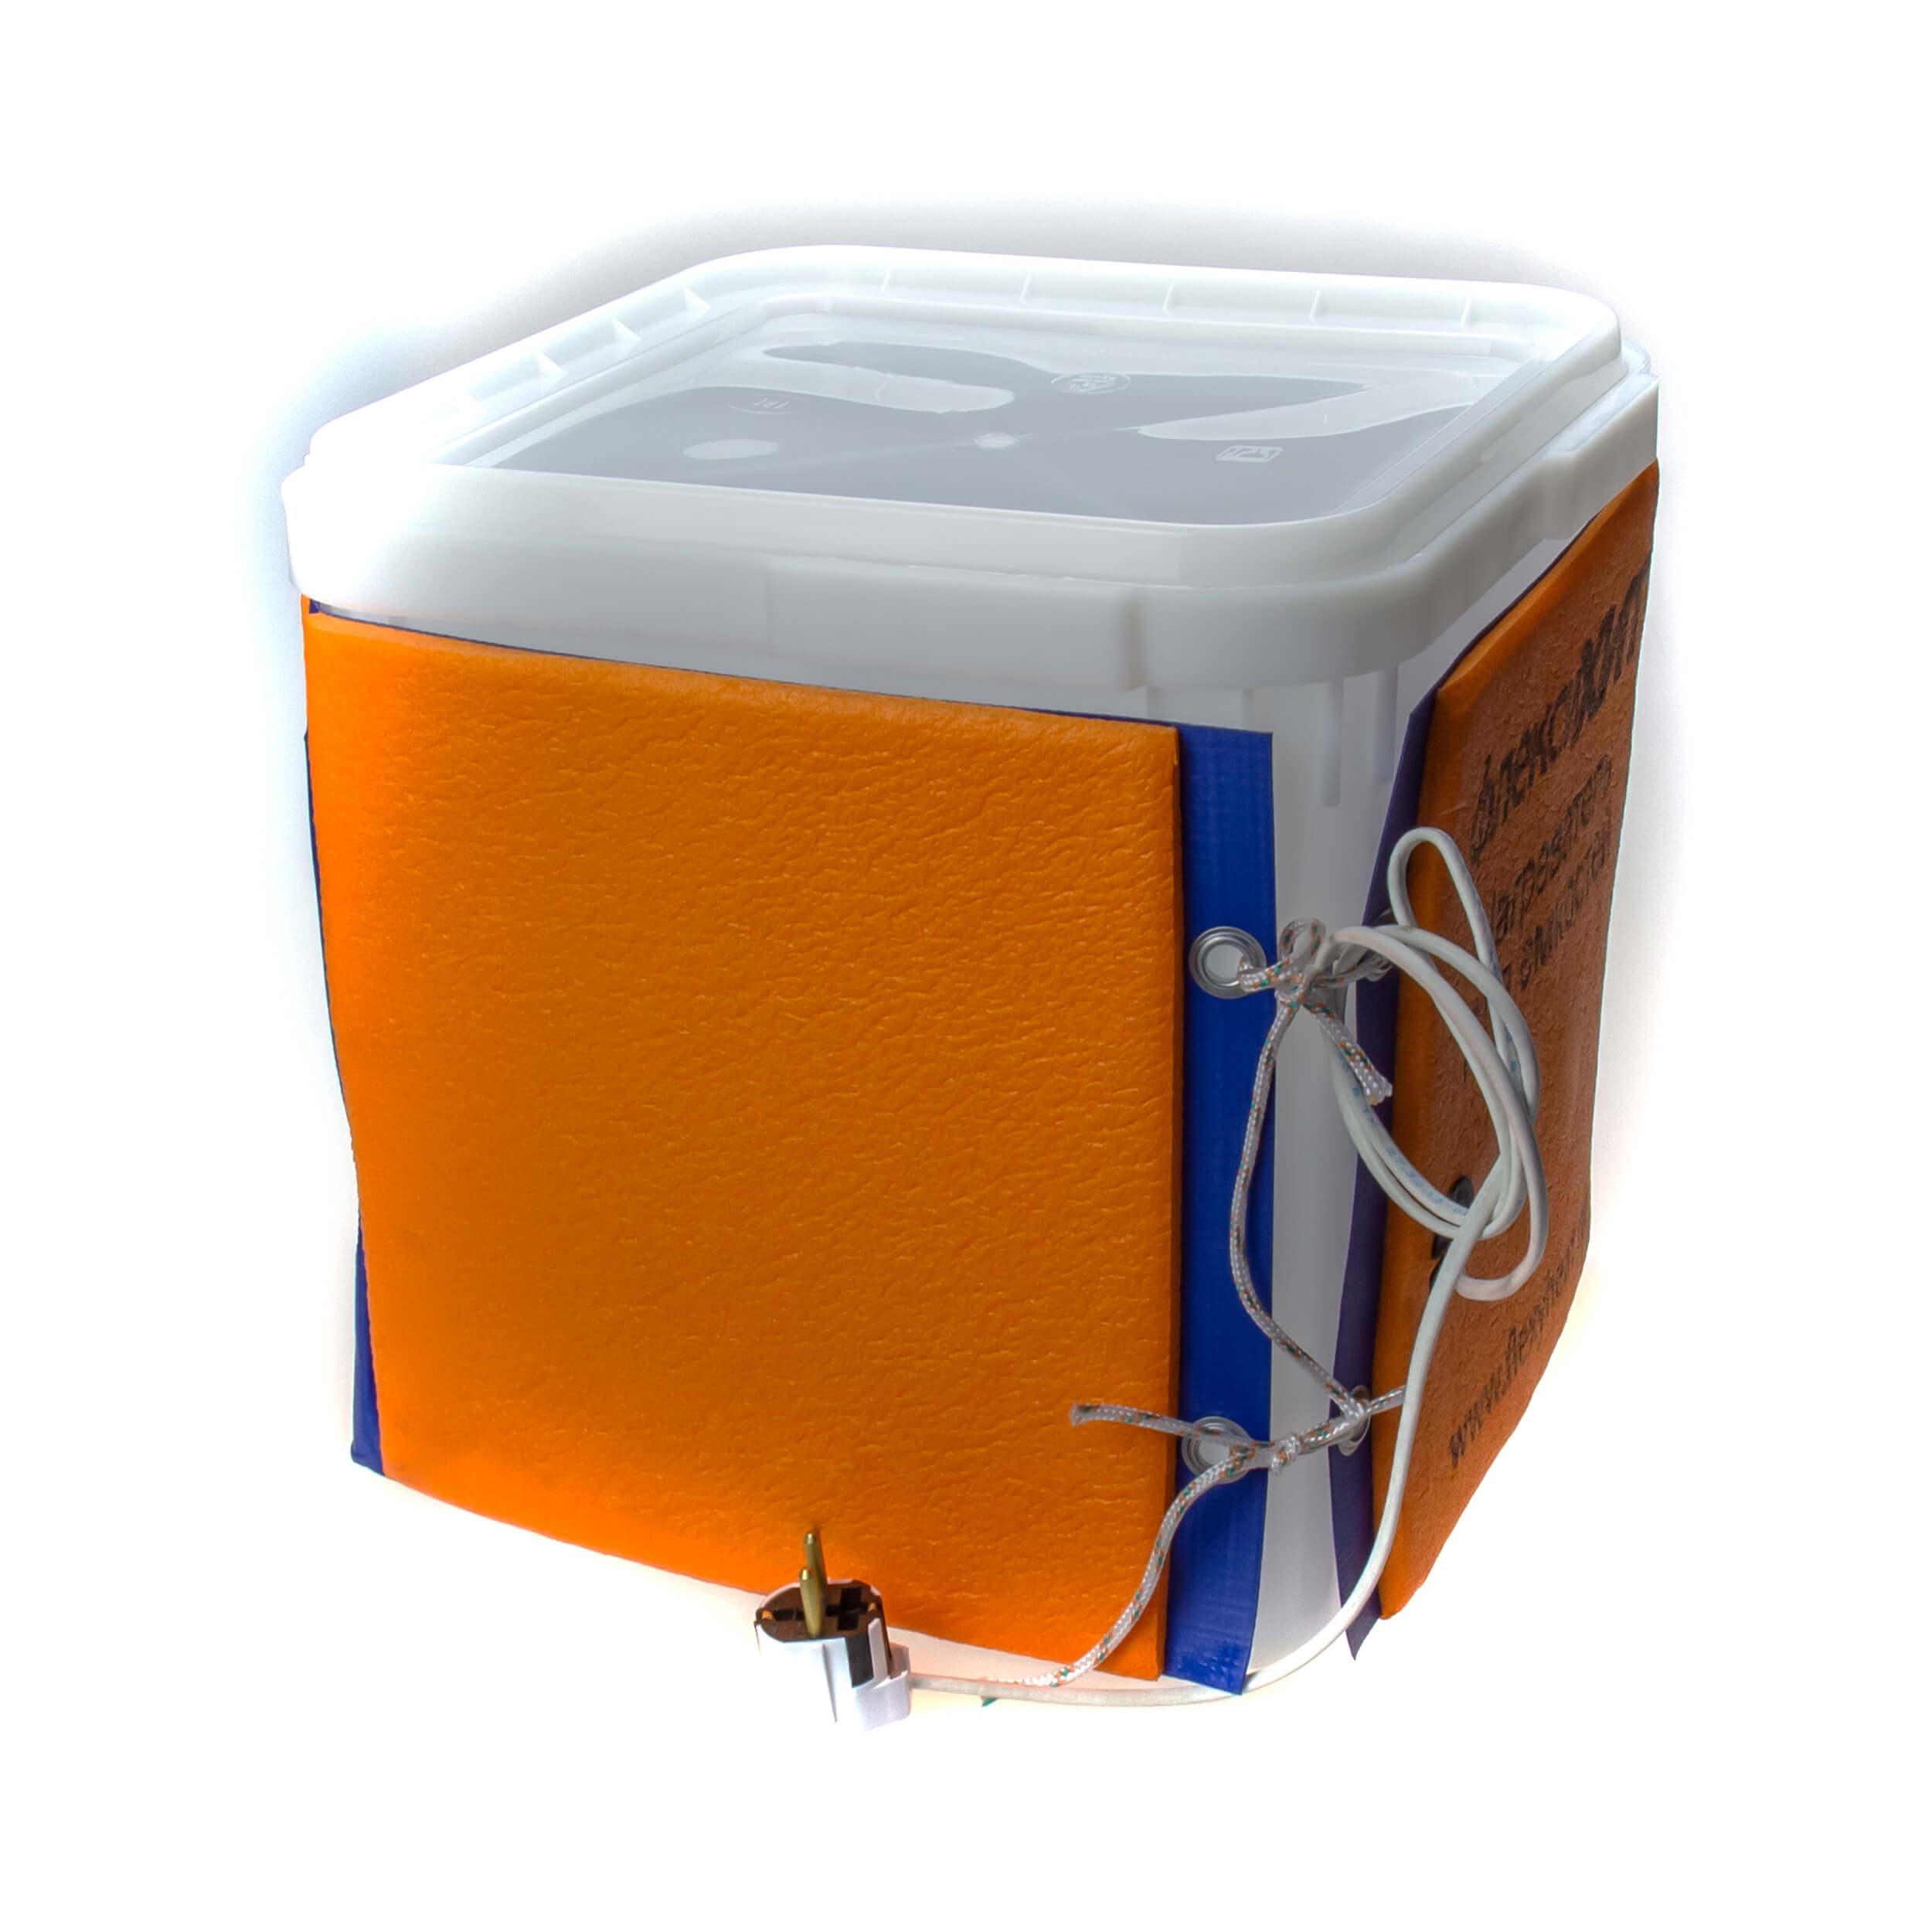 Декристаллизатор меда на кубитейнер (220B) фото